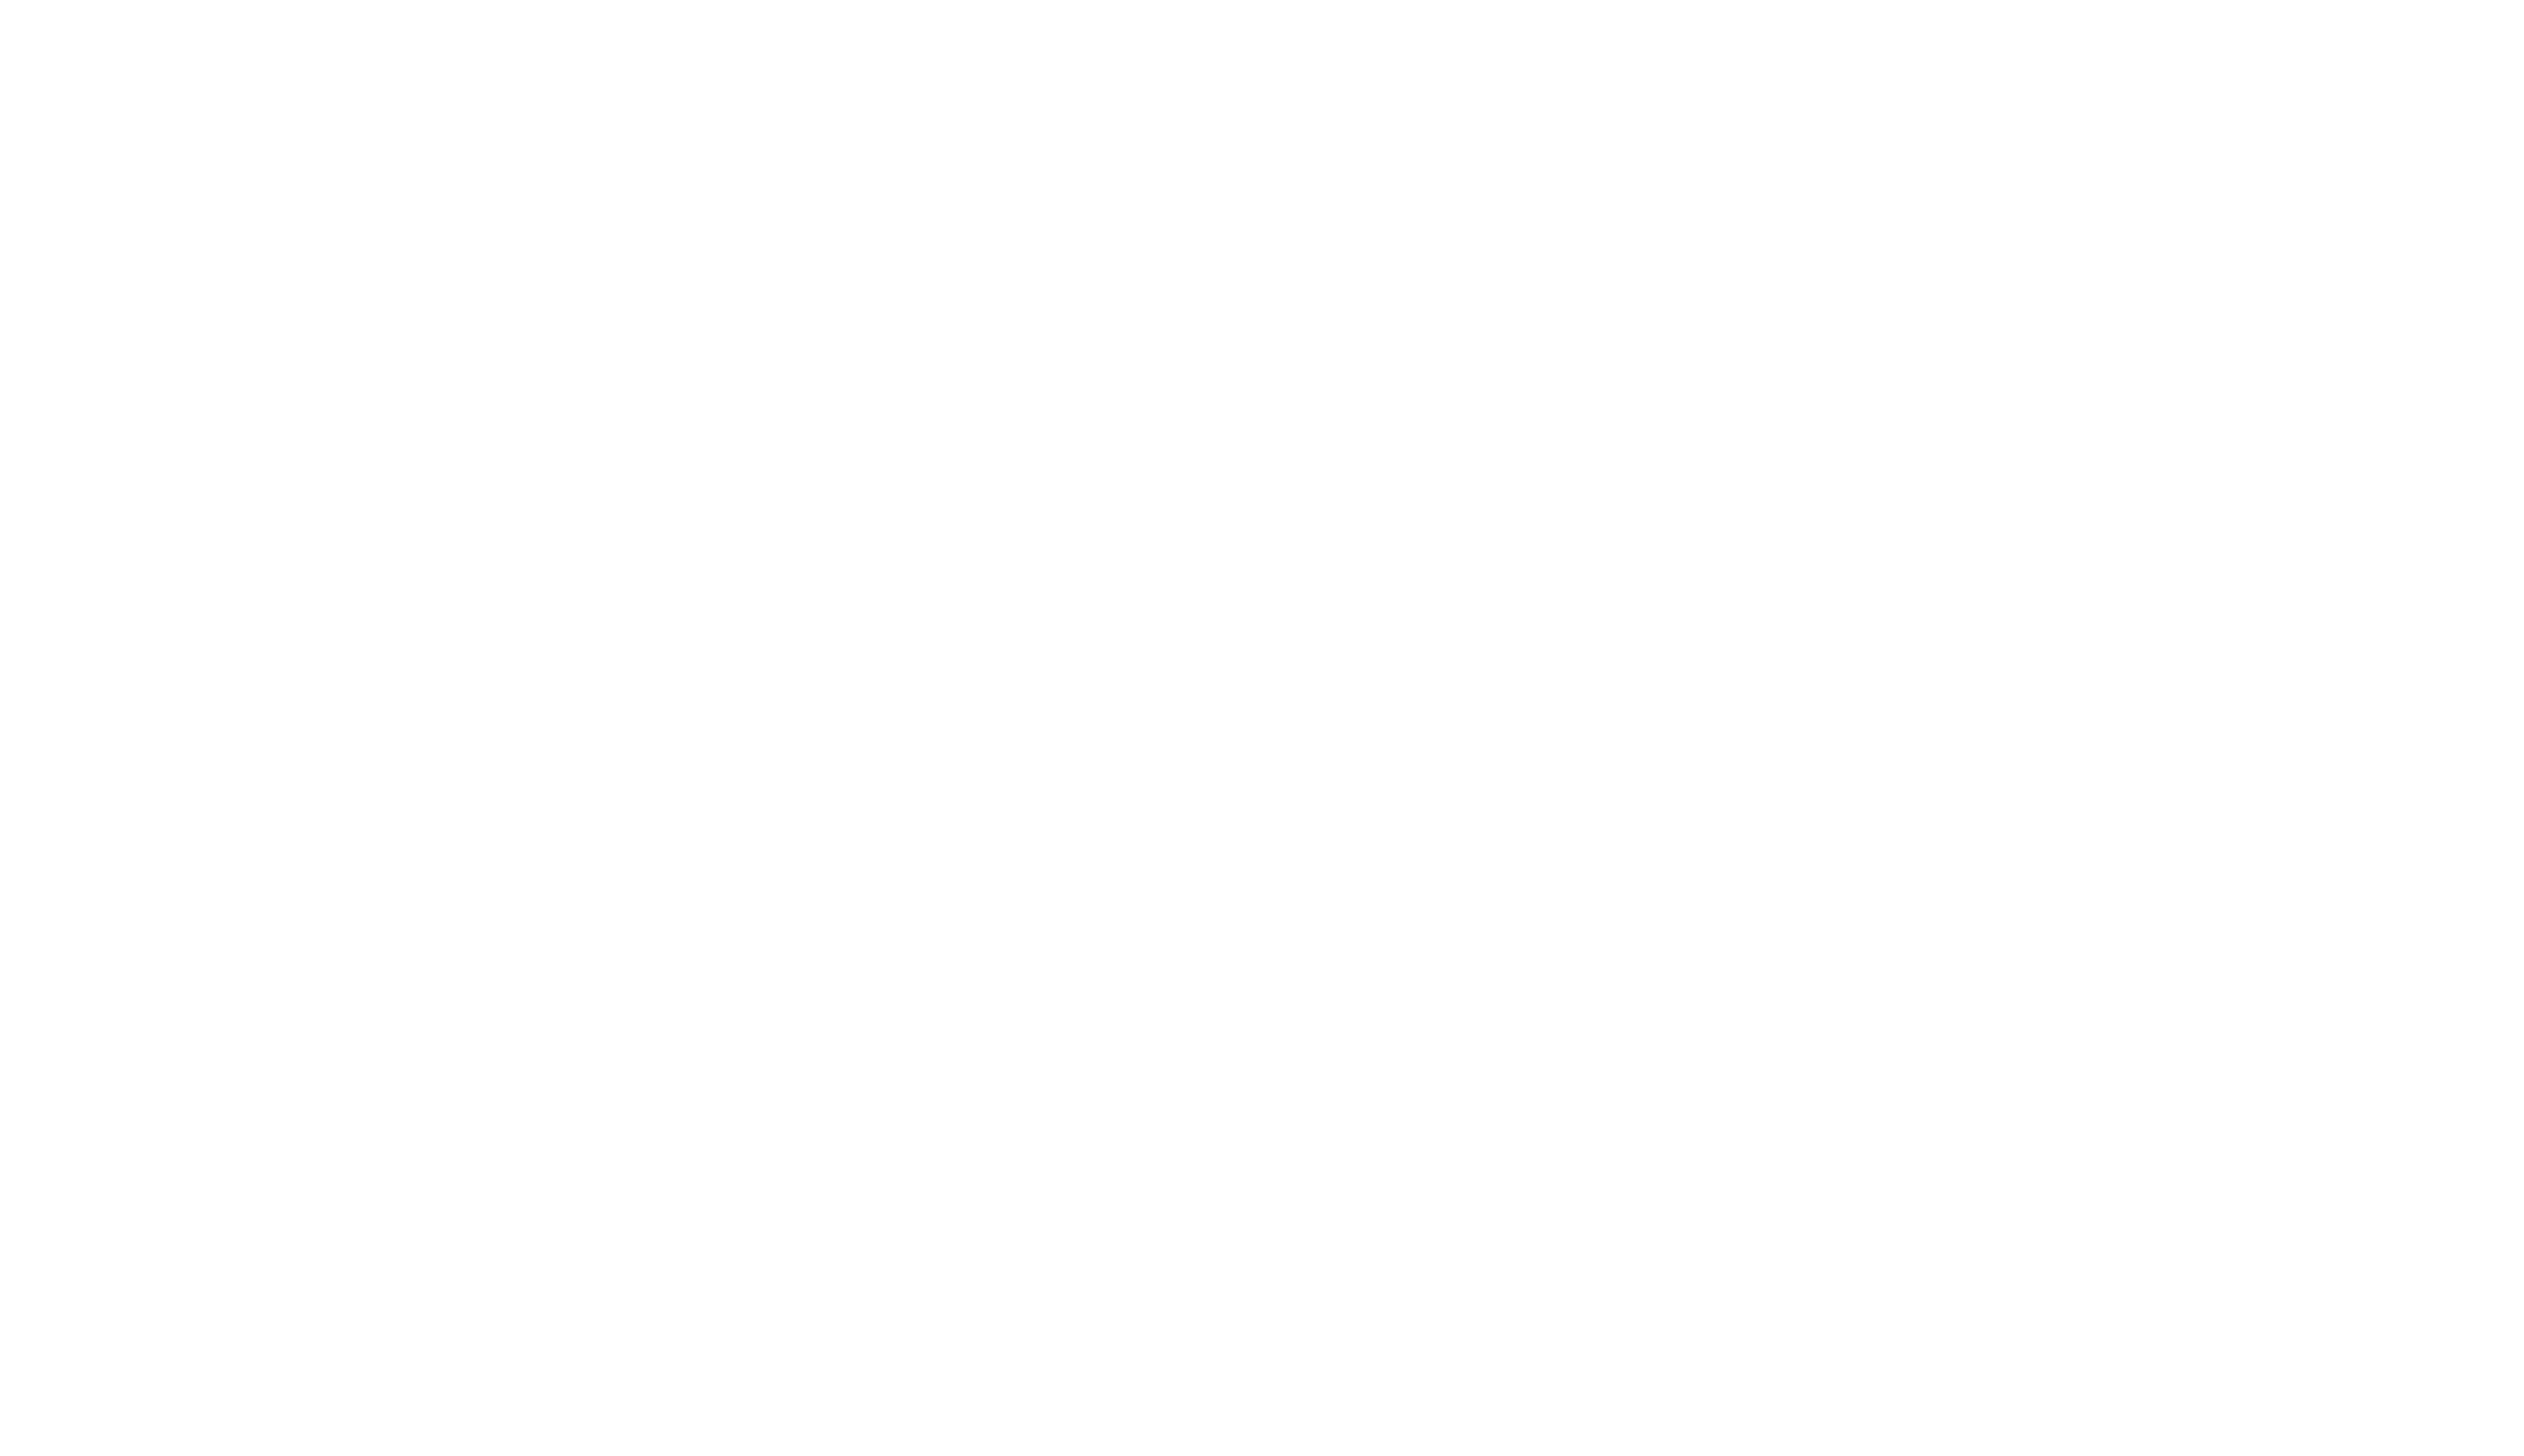 Xero bronze partner logo